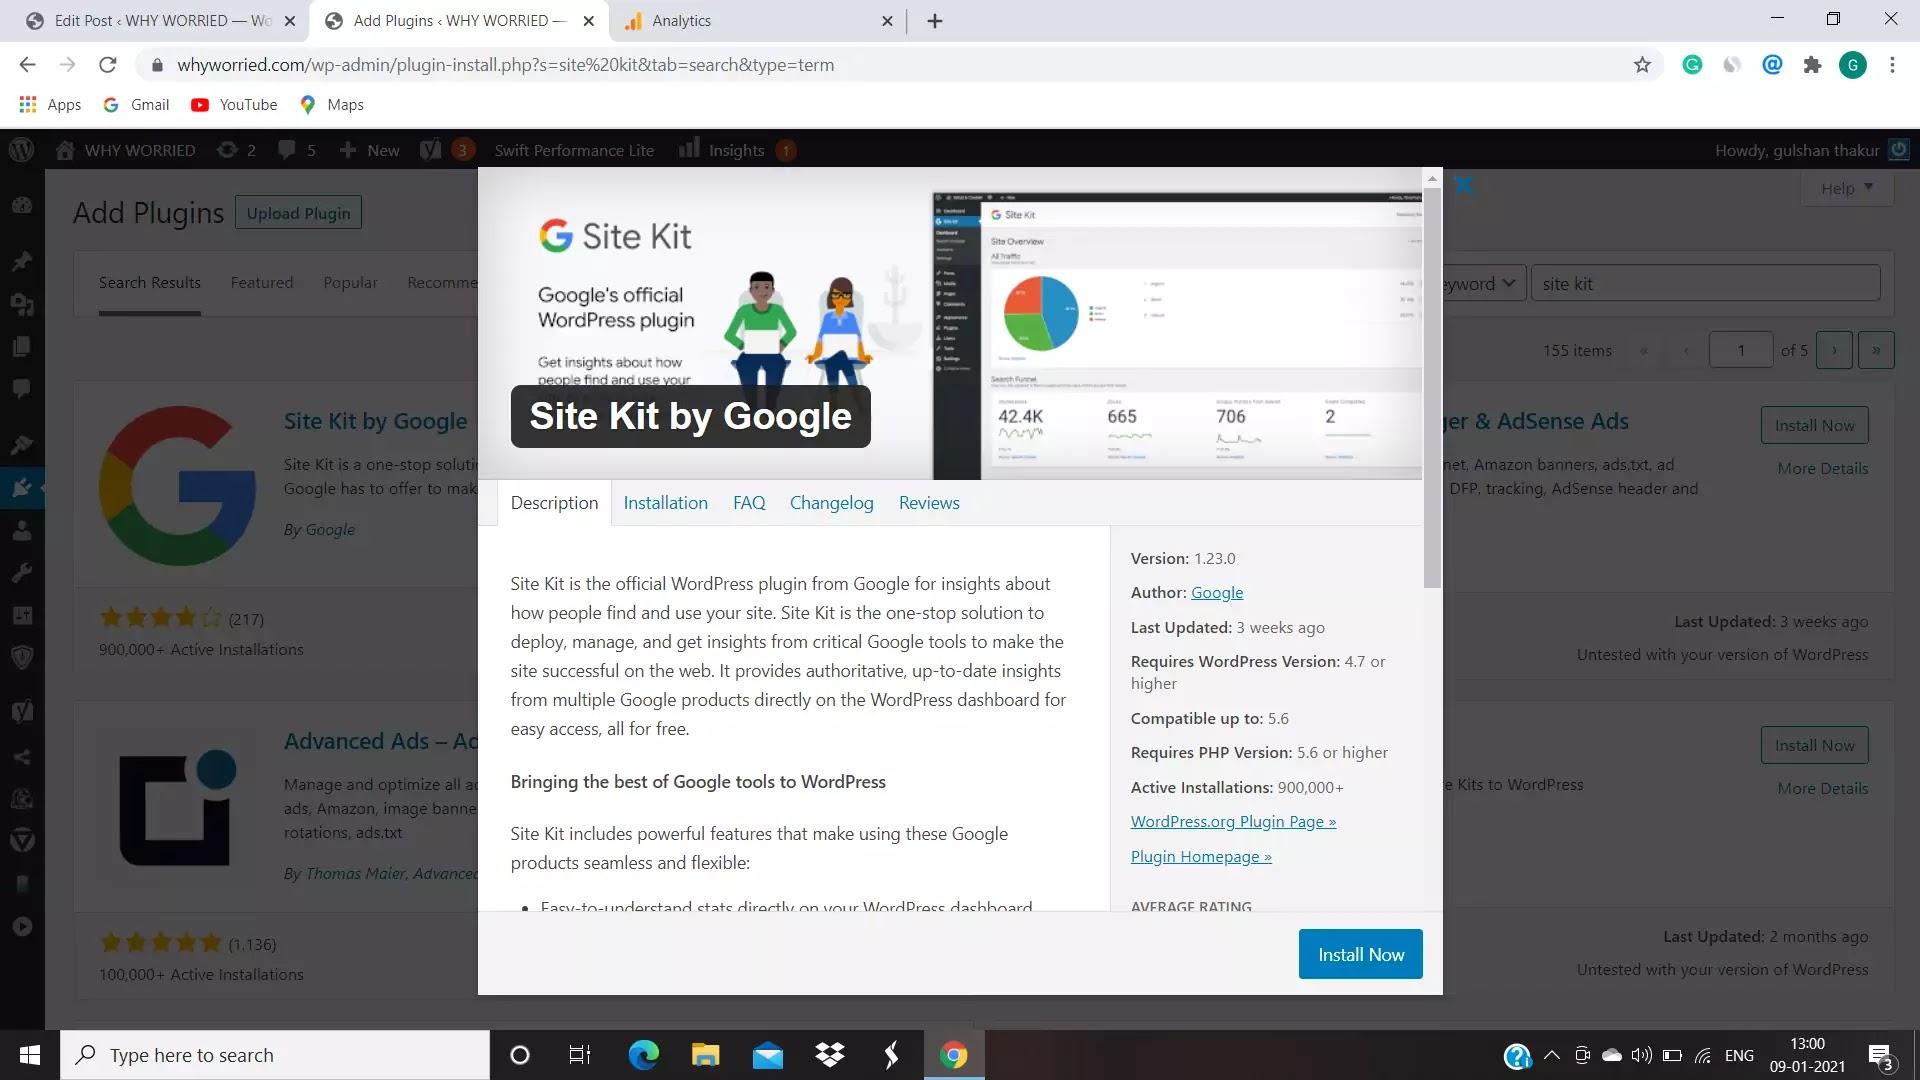 image of google site kit plugin in WordPress plugins area